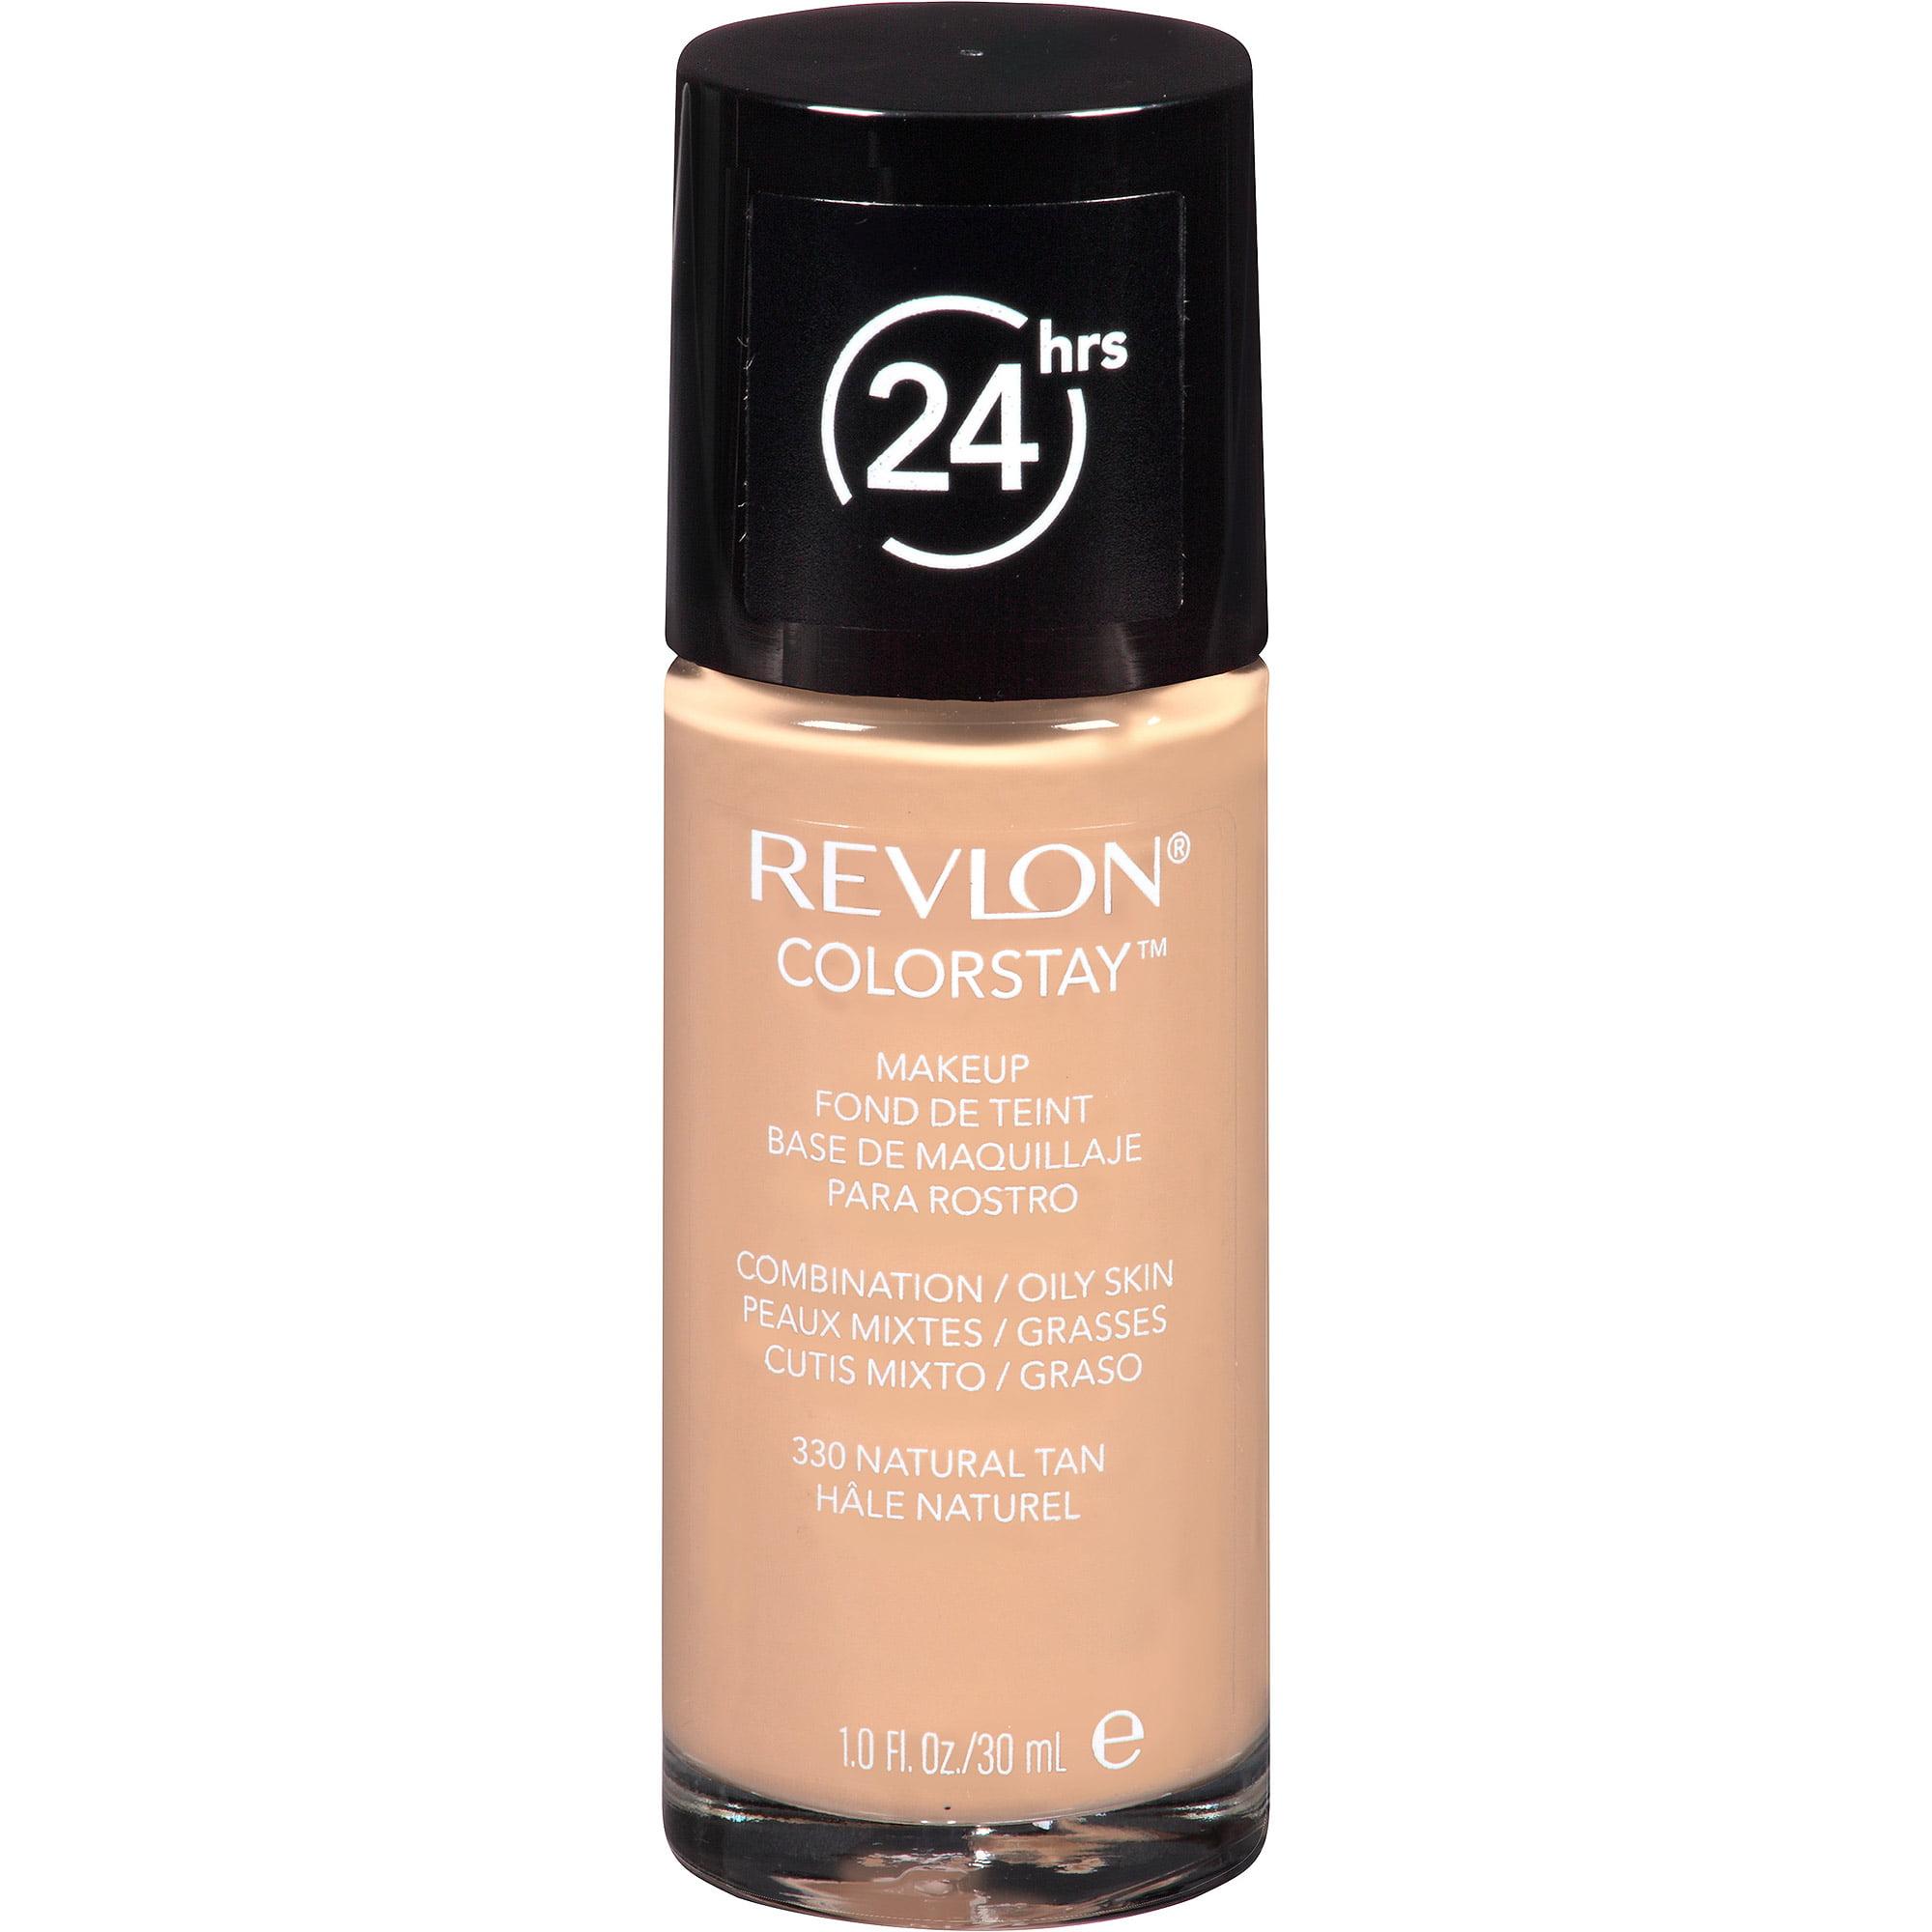 Revlon ColorStay Makeup for Combination/Oily Skin, 330 Natural Tan, 1 fl oz